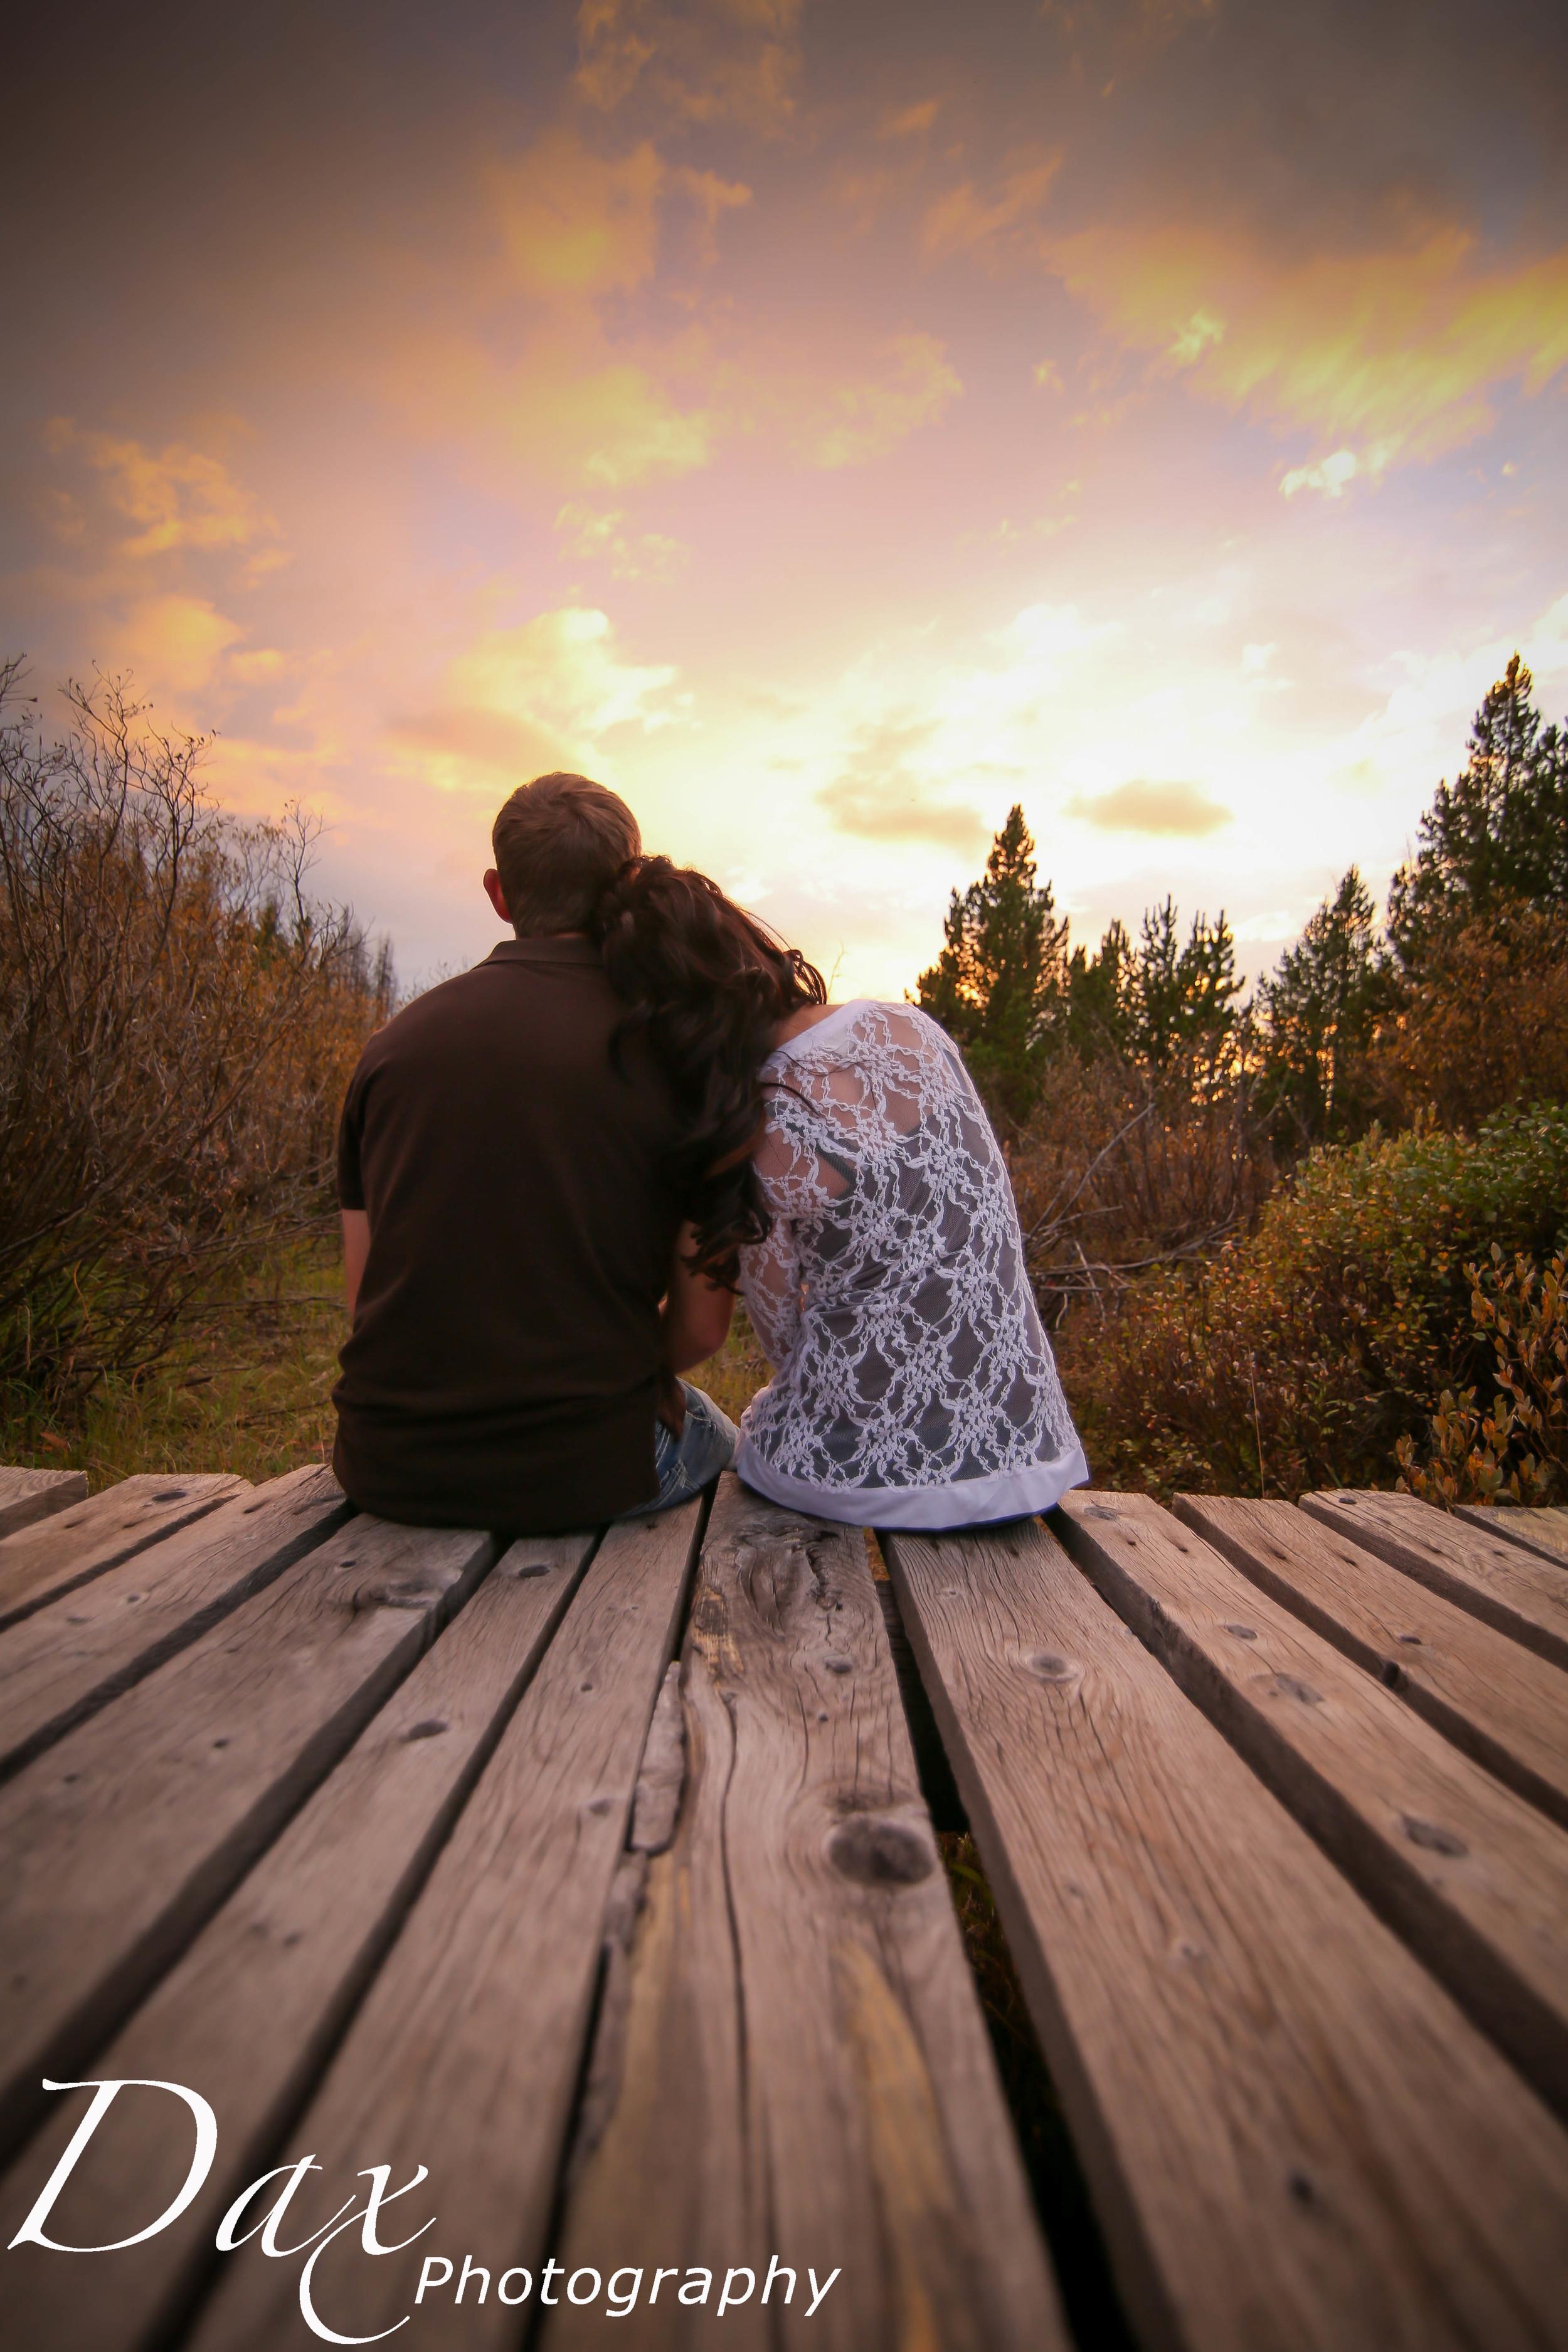 wpid-Montana-photographer-Engagement-Portrait-51181.jpg